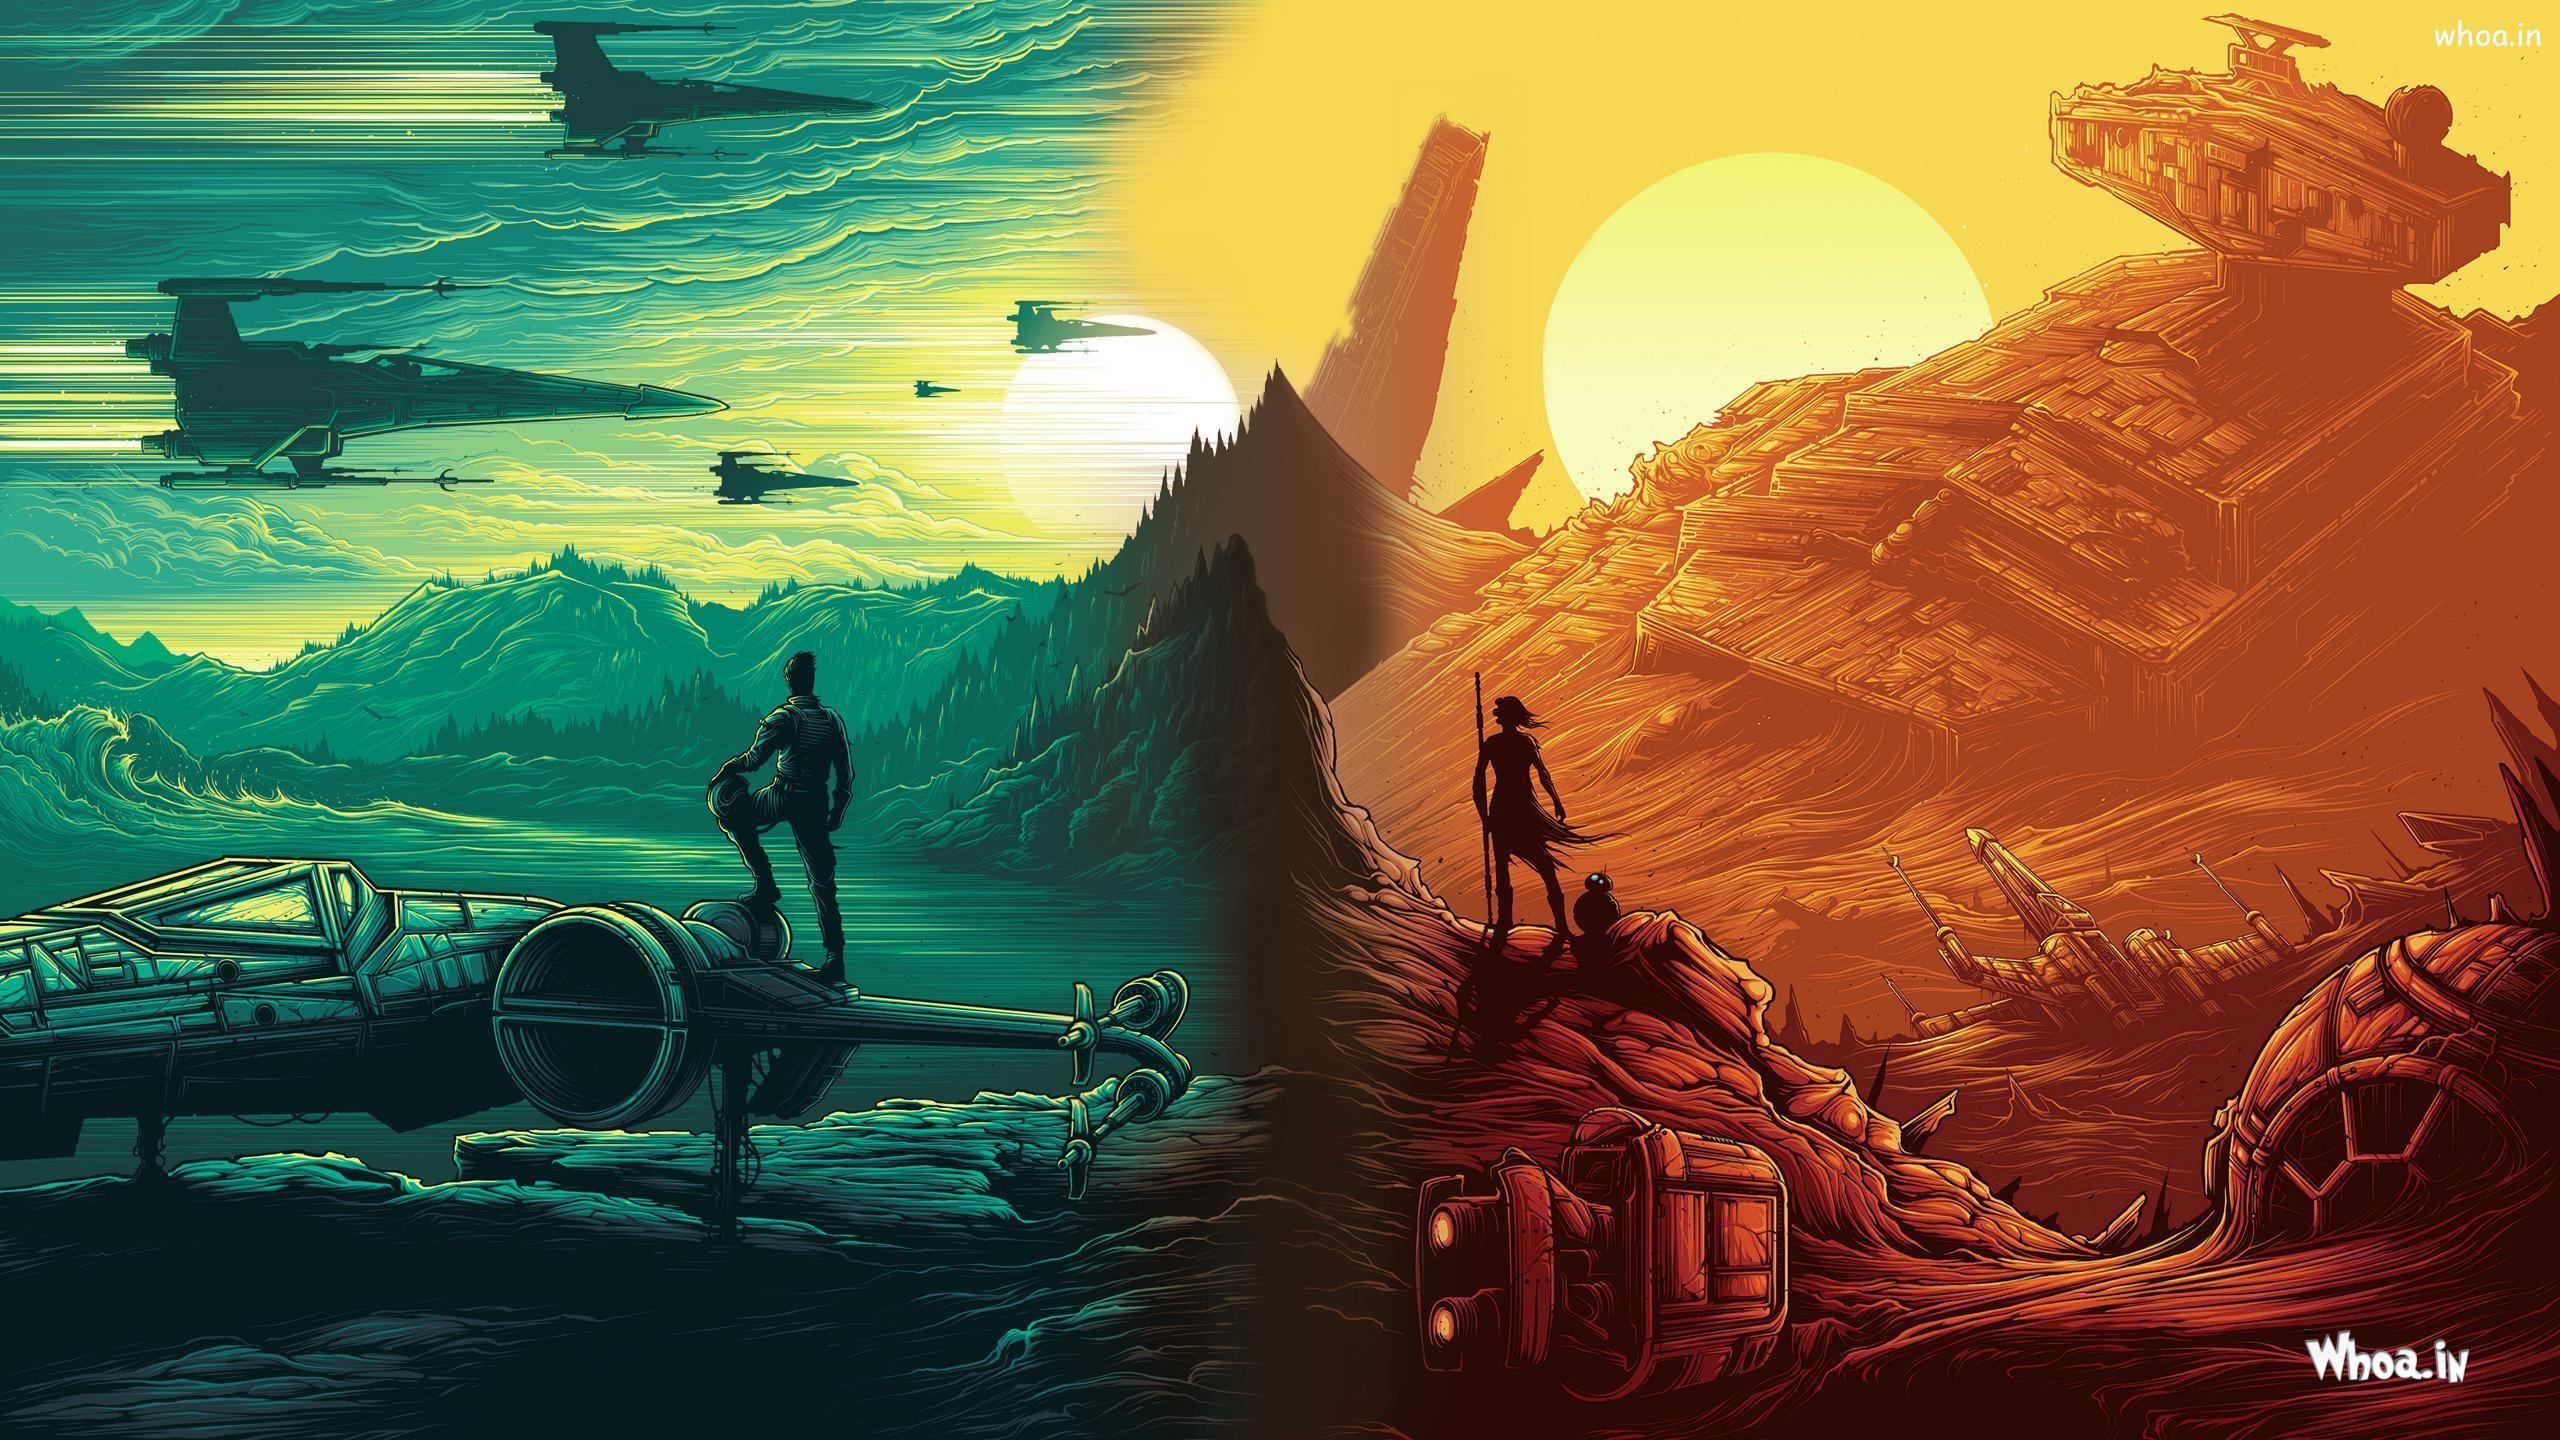 … Star Wars the Force Awakens Movies HD Wallpaper …